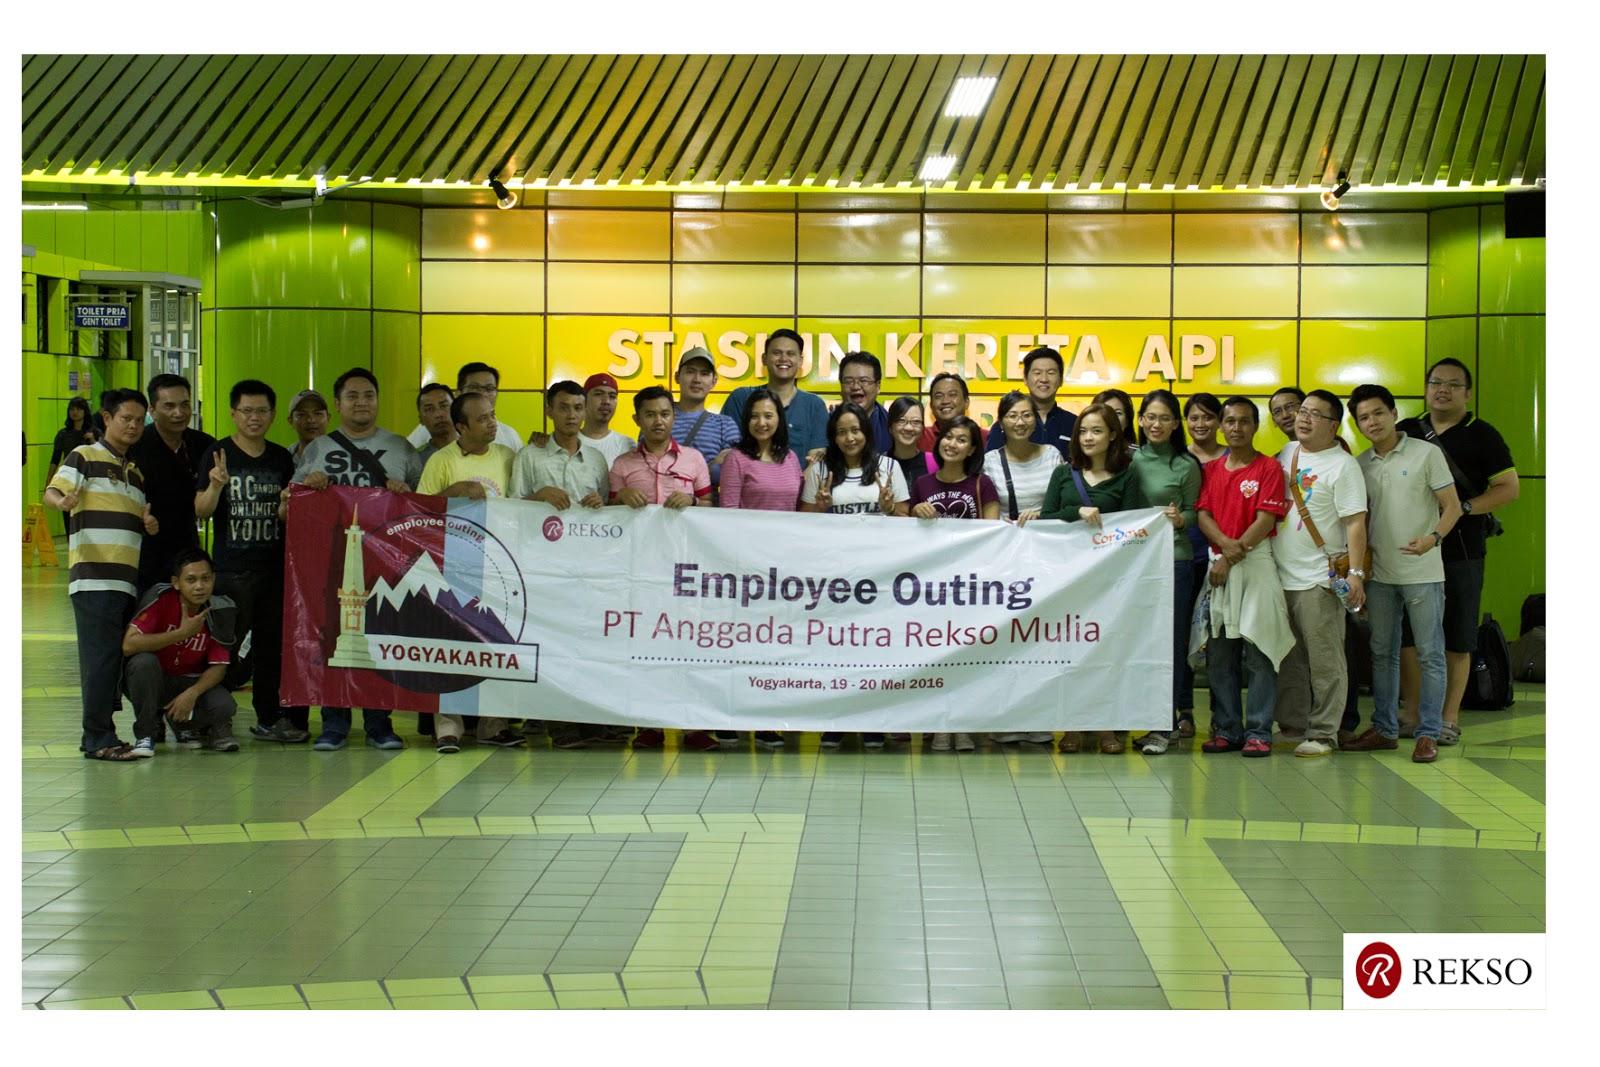 Employee Gathering 2016 PT Anggada Putra Rekso Mulia to Yogyakarta